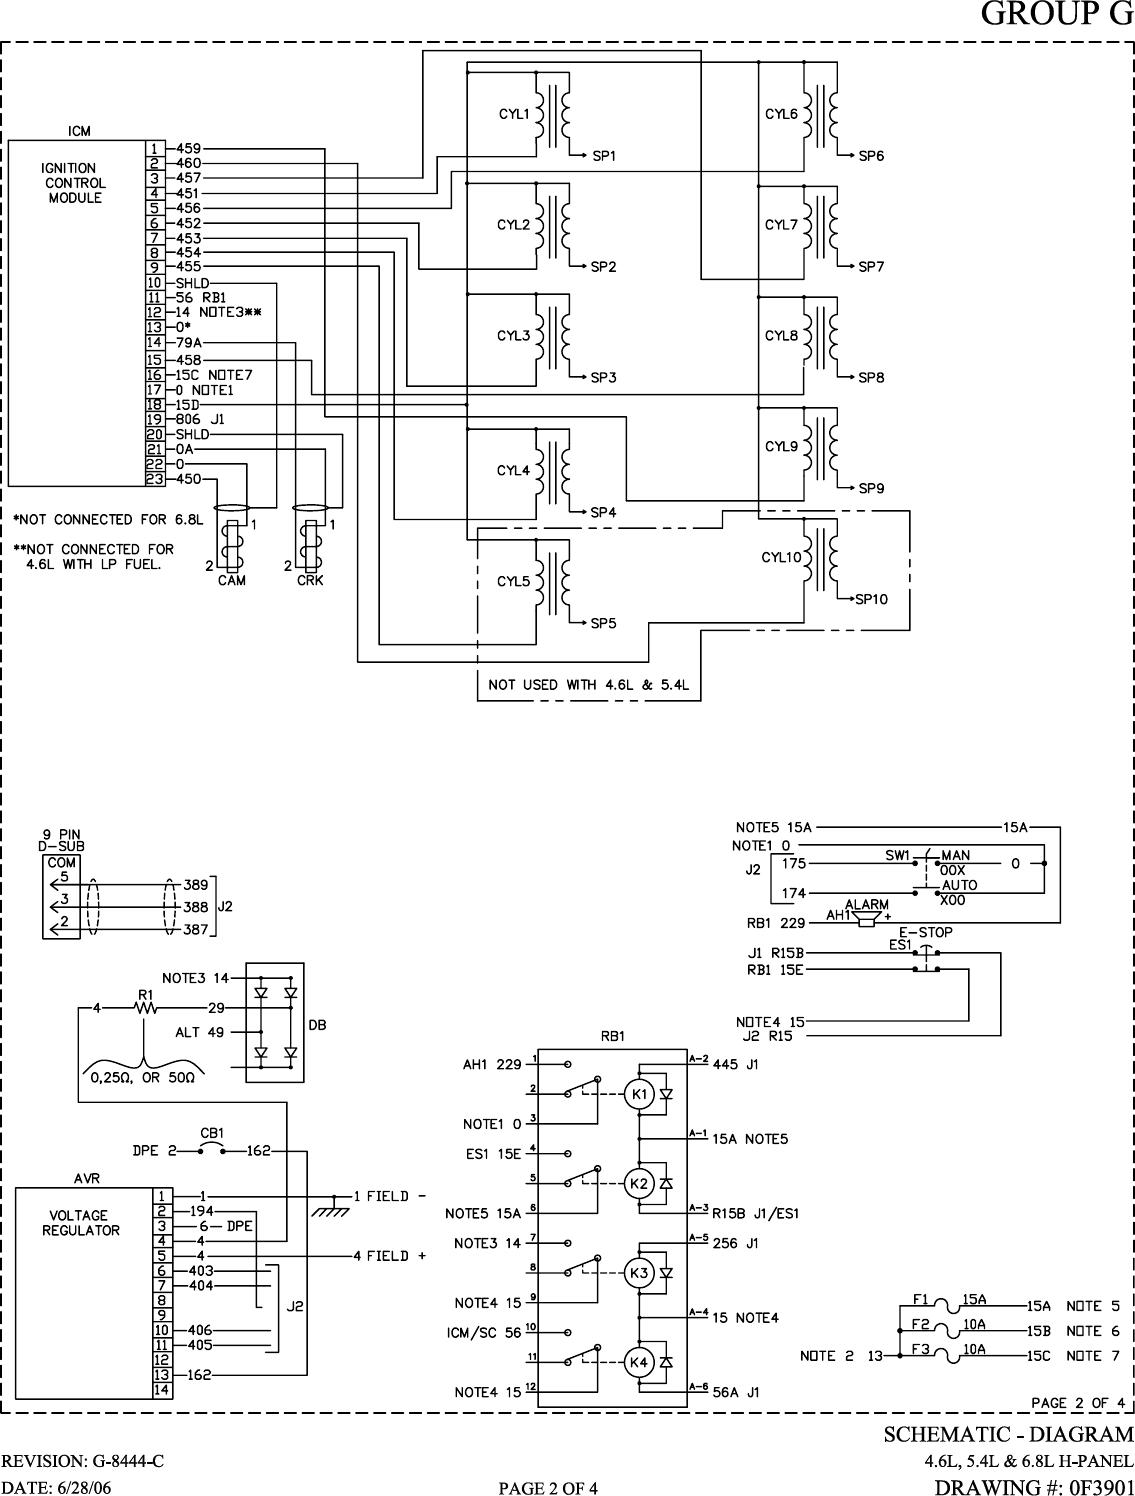 Standby generator sets